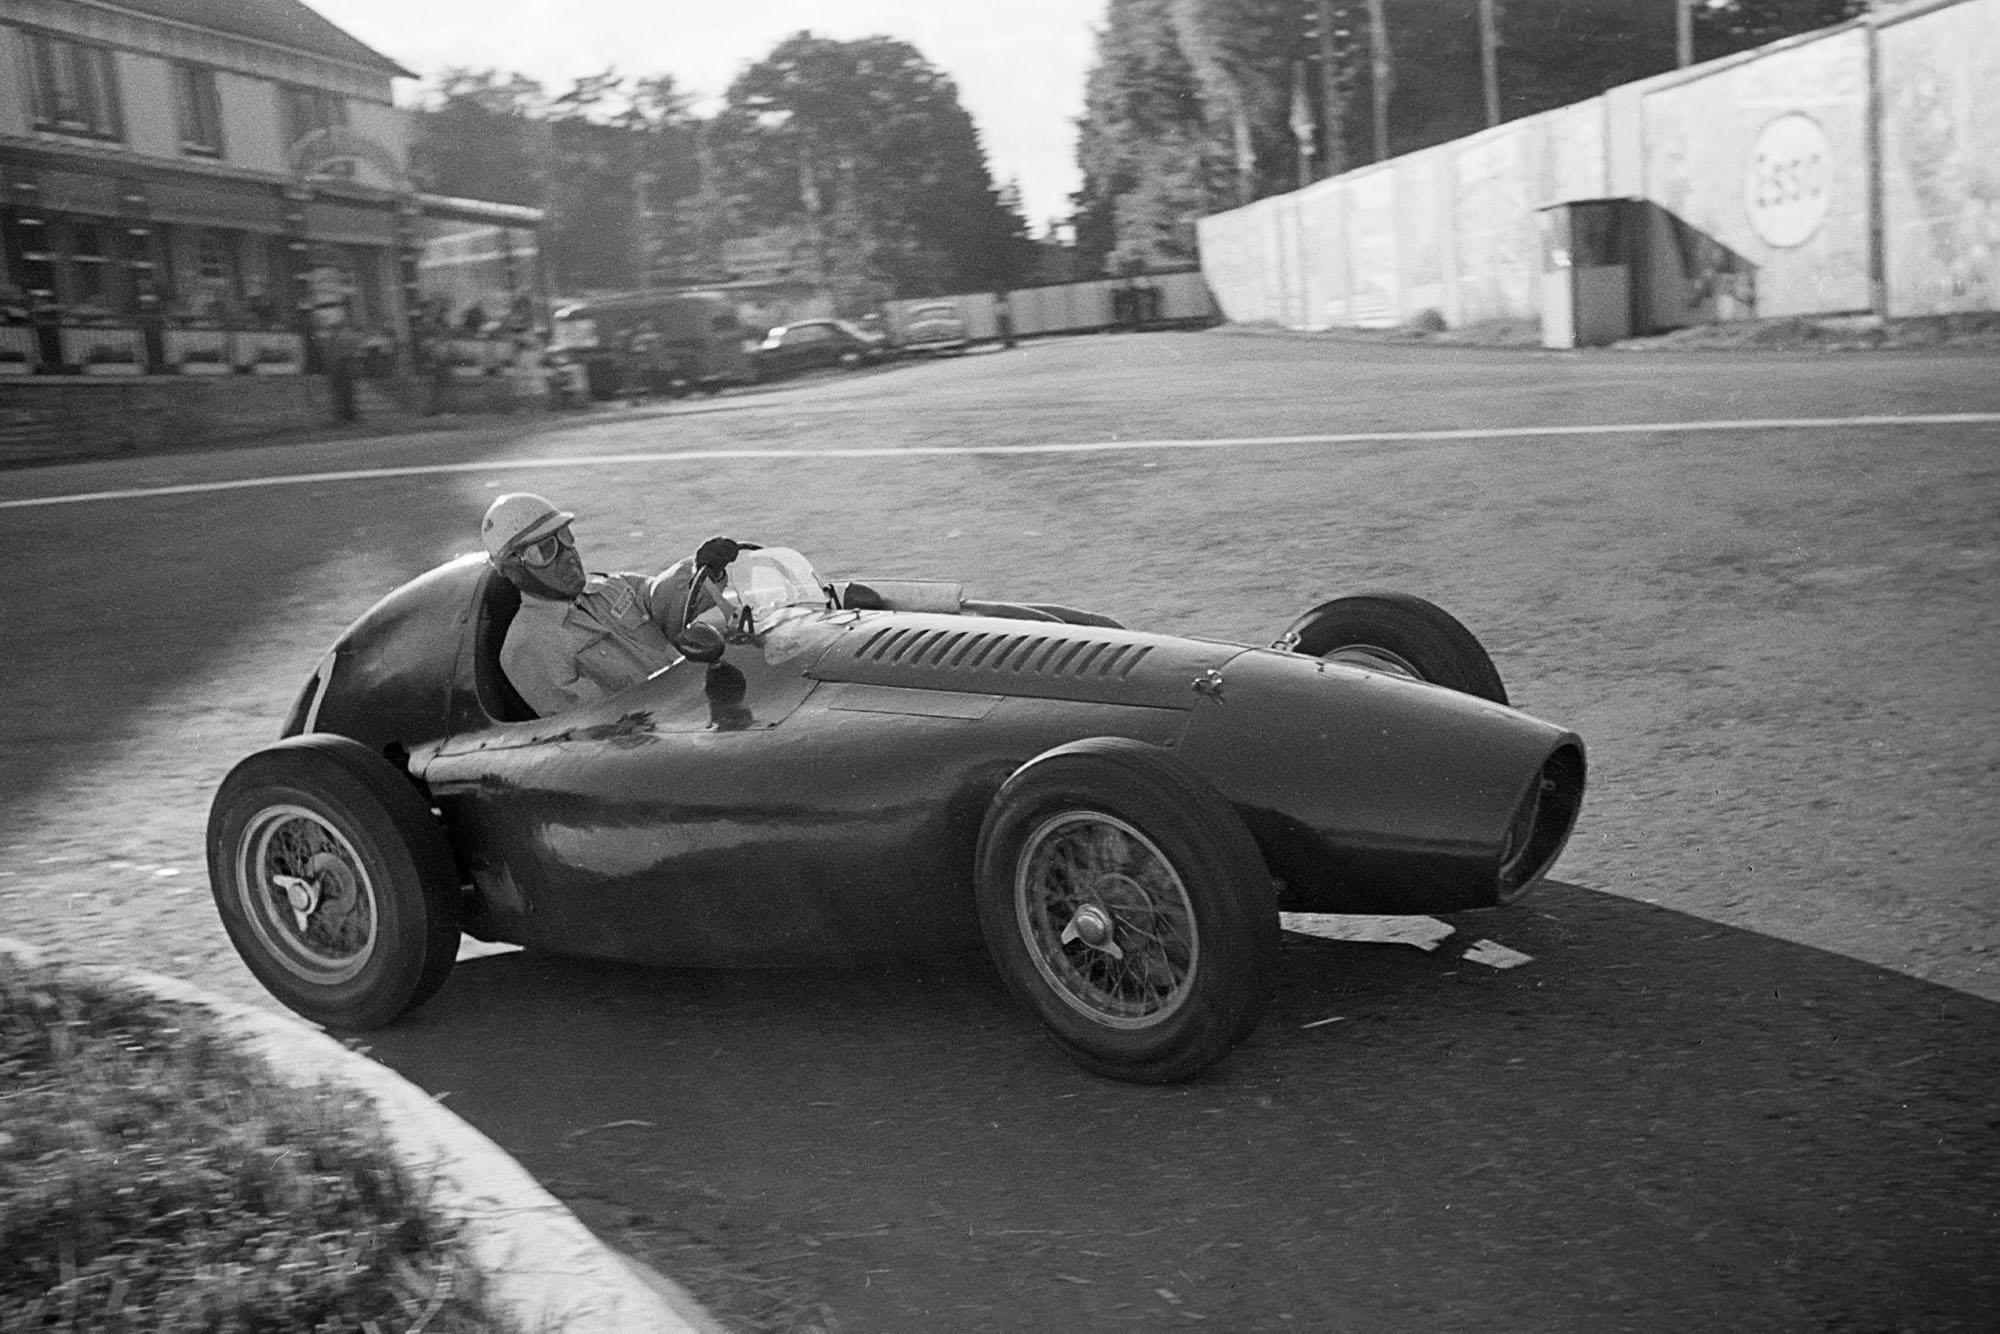 Nino Farina, Ferrari 553 , Grand Prix of Belgium, Circuit de Spa-Francorchamps, 20 June 1954. (Photo by Bernard Cahier/Getty Images)